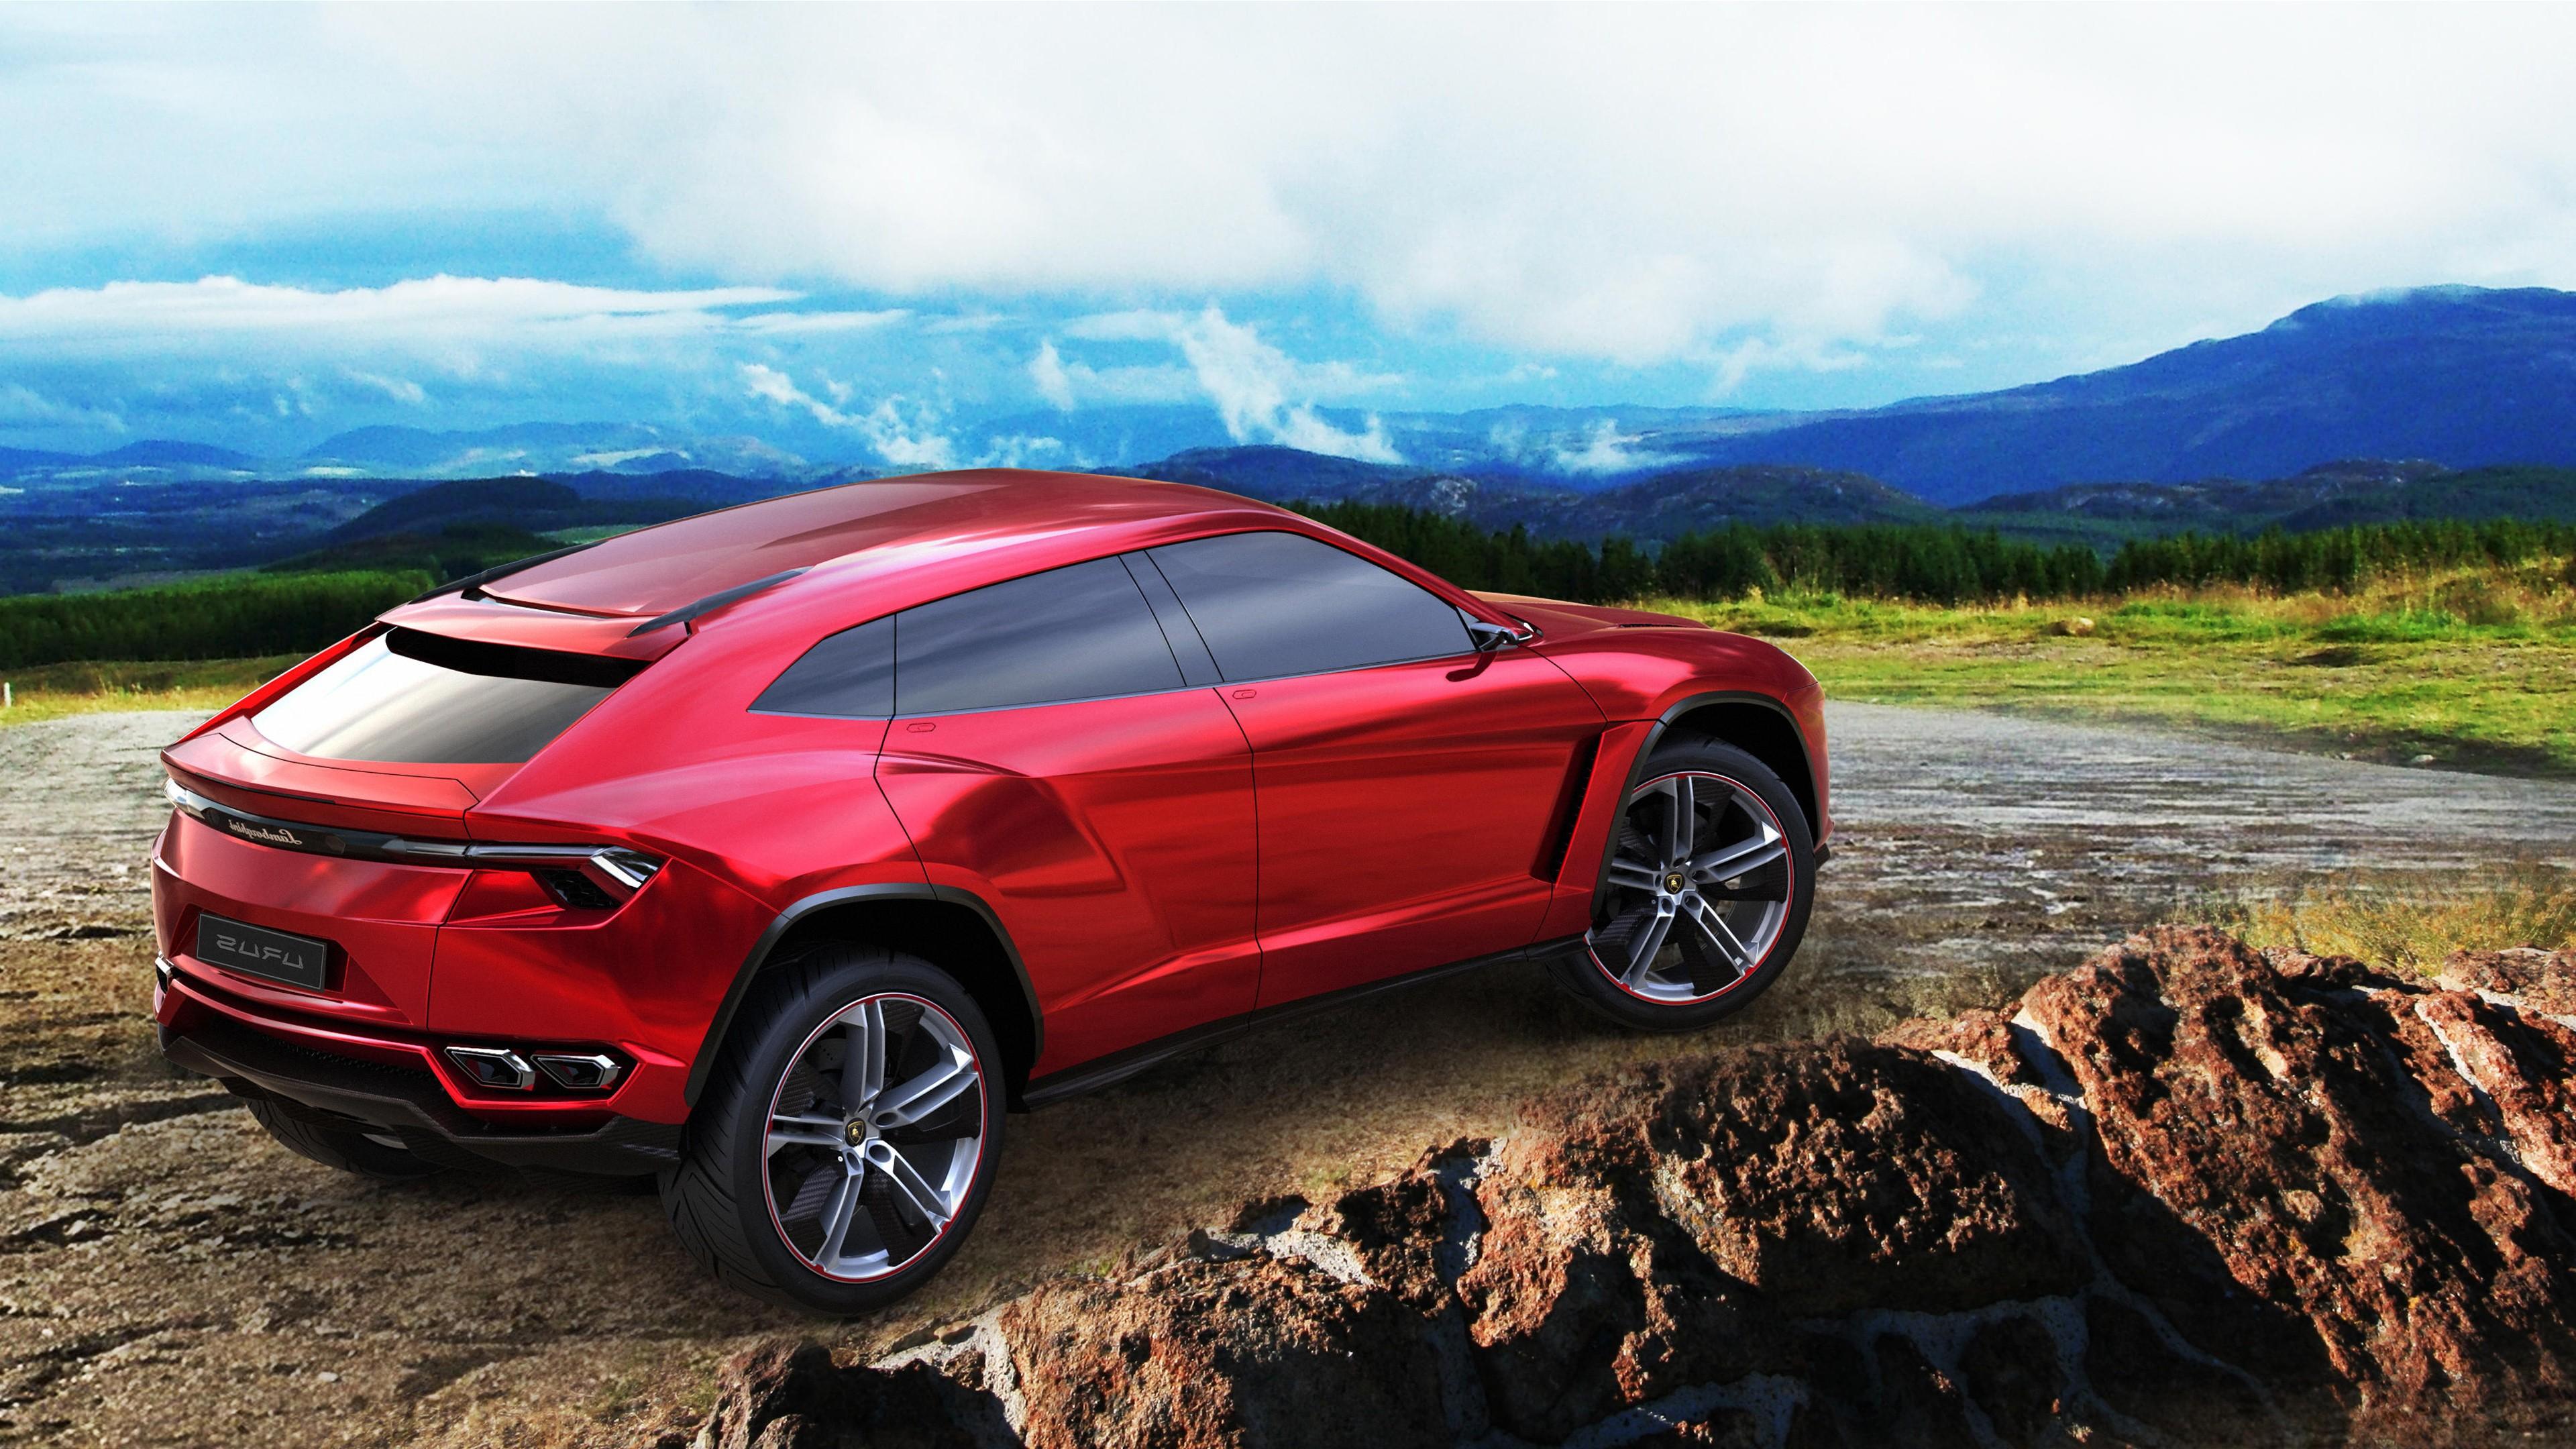 Lamborghini Urus Concept, HD Cars, 4k Wallpapers, Images ...